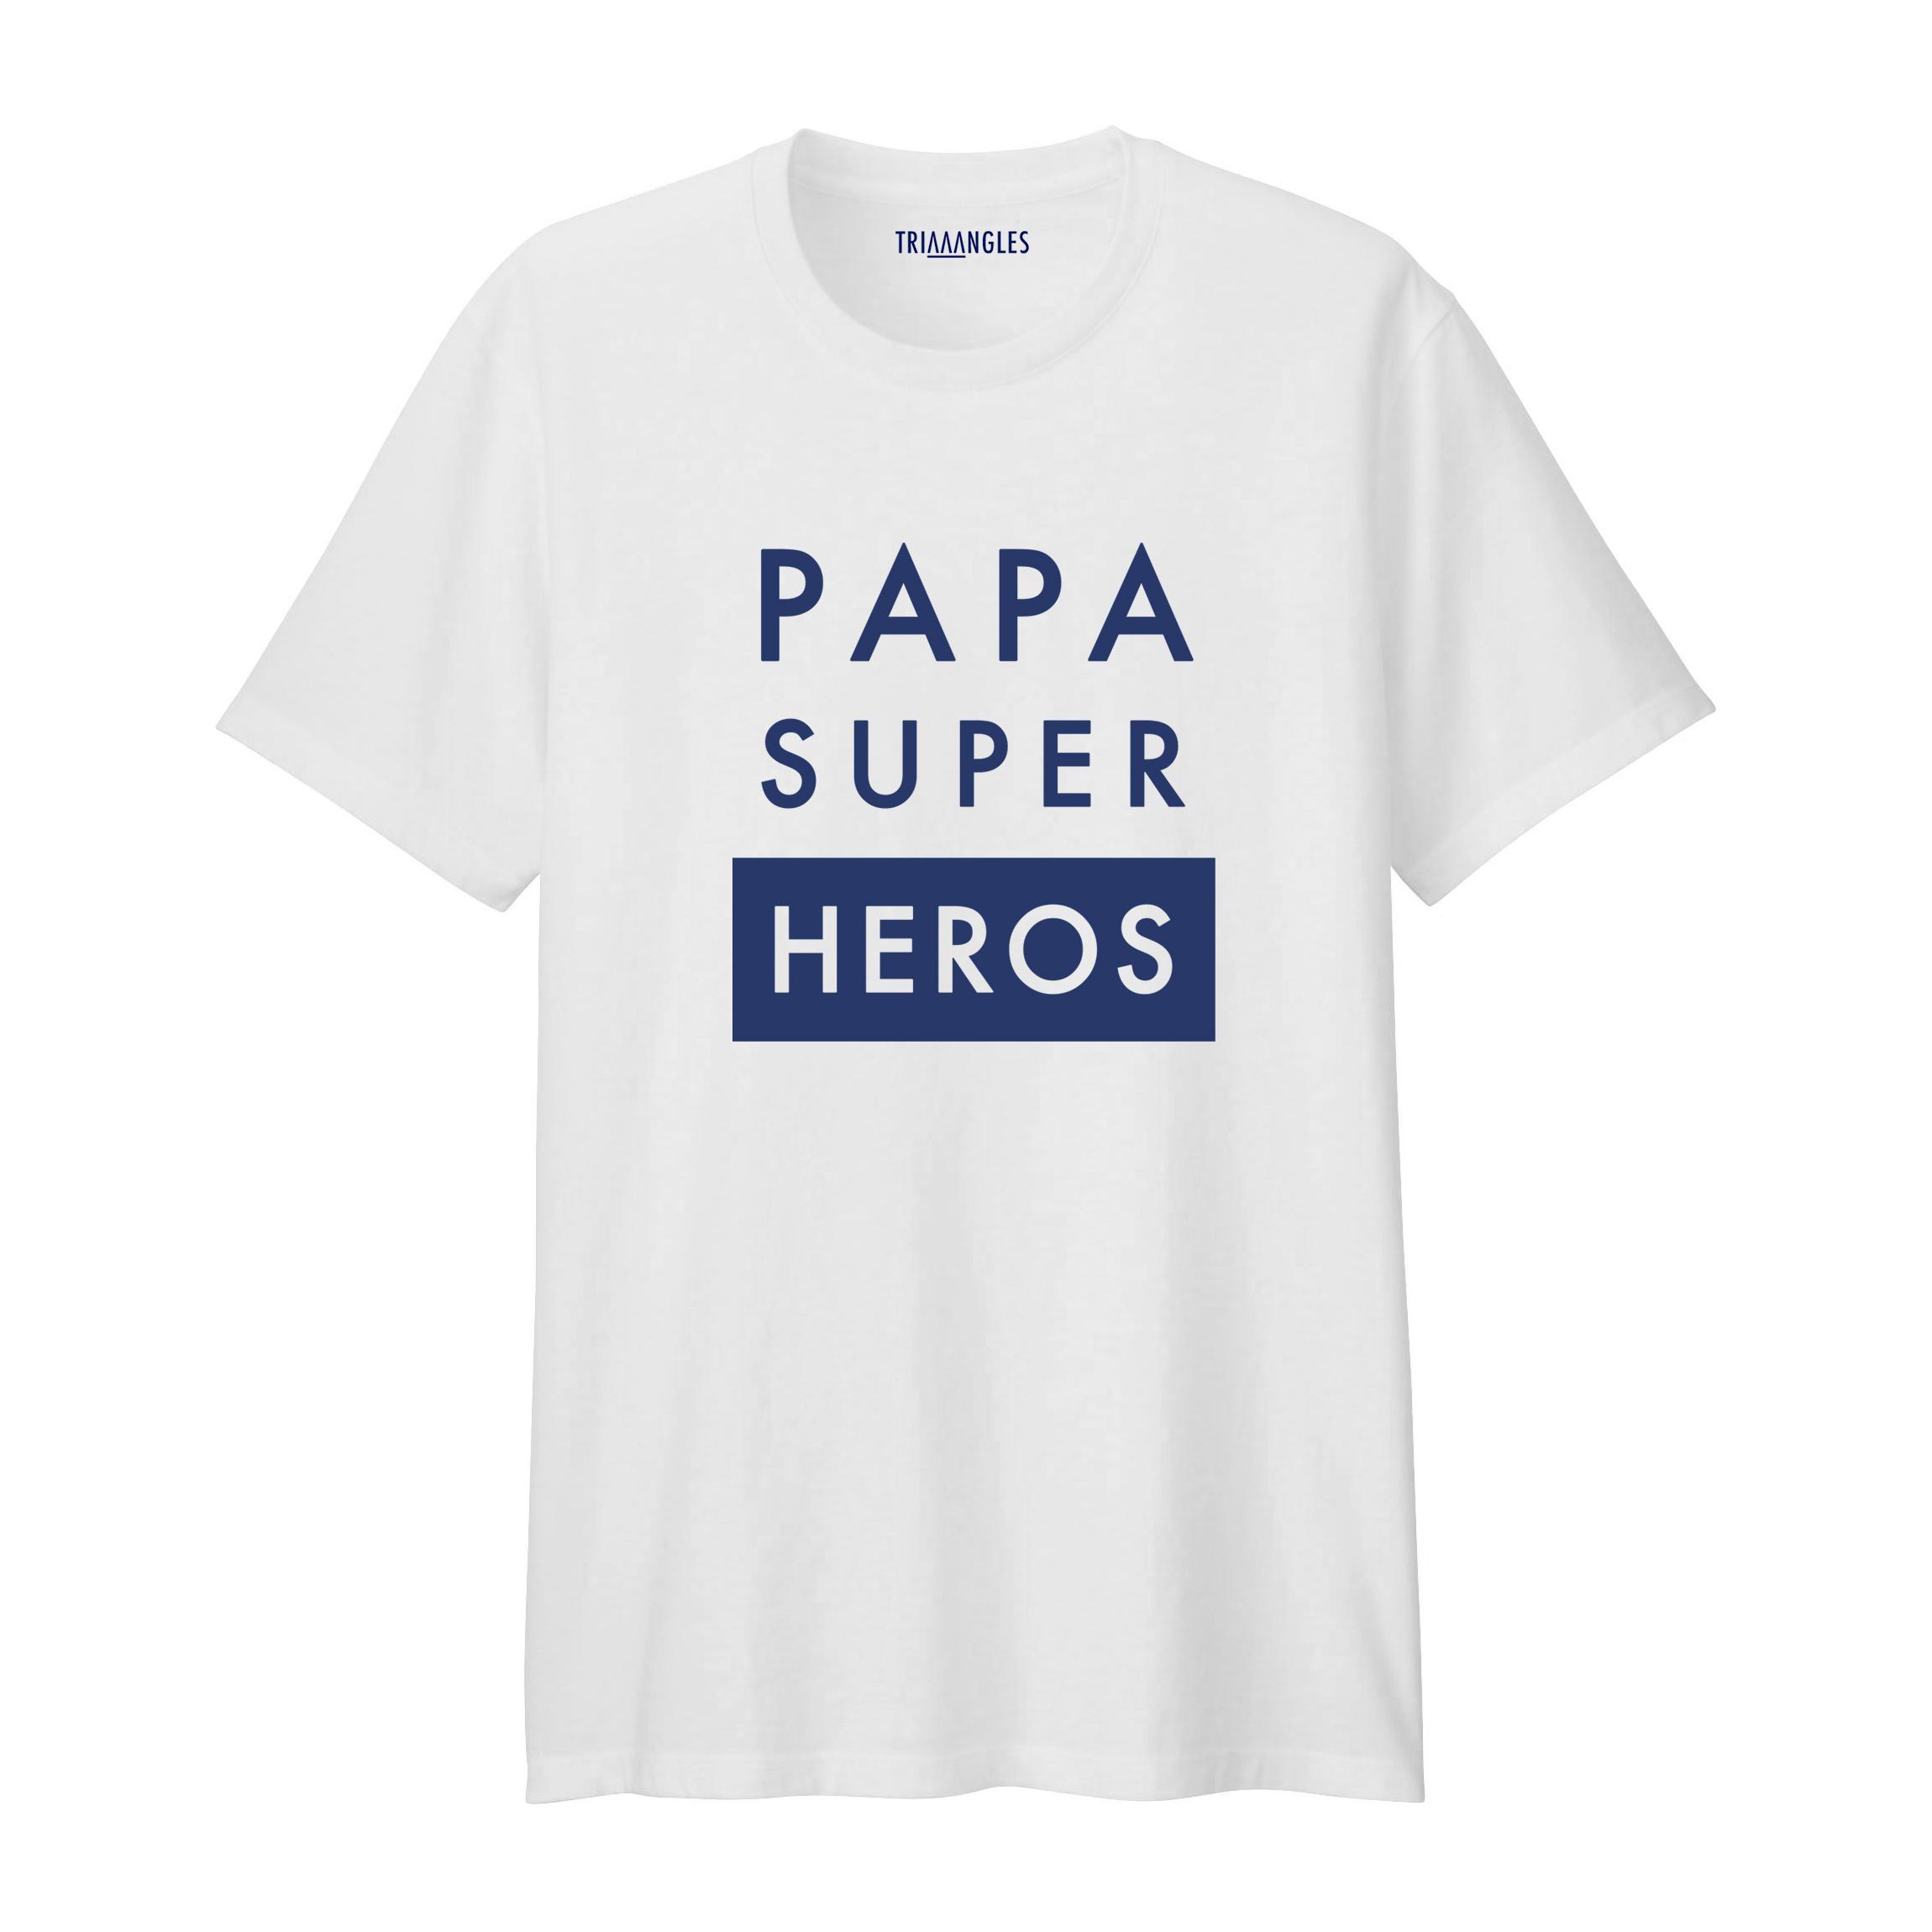 Tshirt blanc col rond - Coupe Homme - Artshop Triaaangles ® : Papa Super